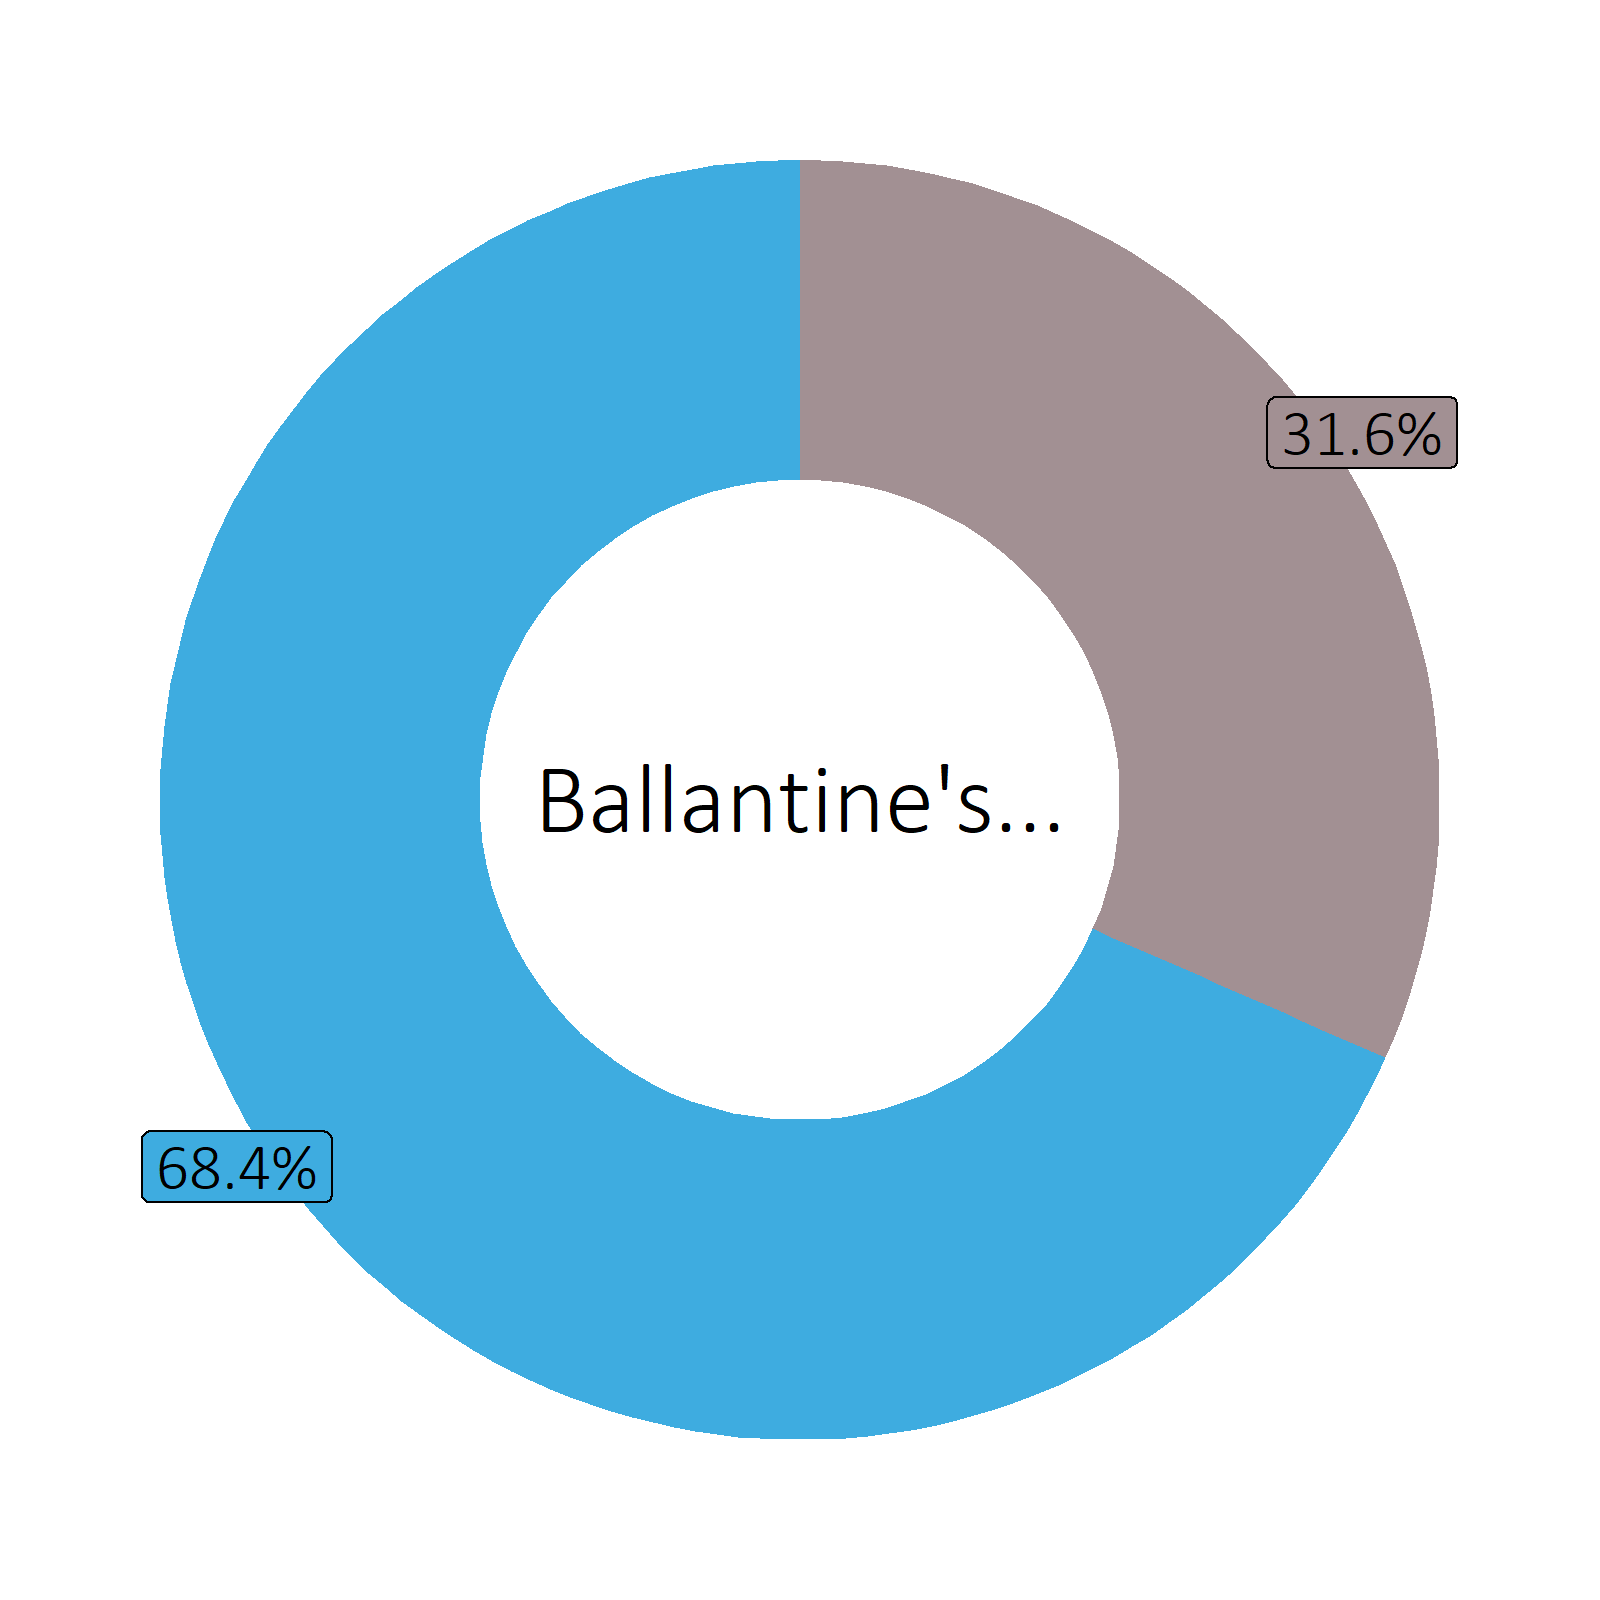 Bestandteile Ballantine's Finest blended Scotch Whisky (40 vol%)